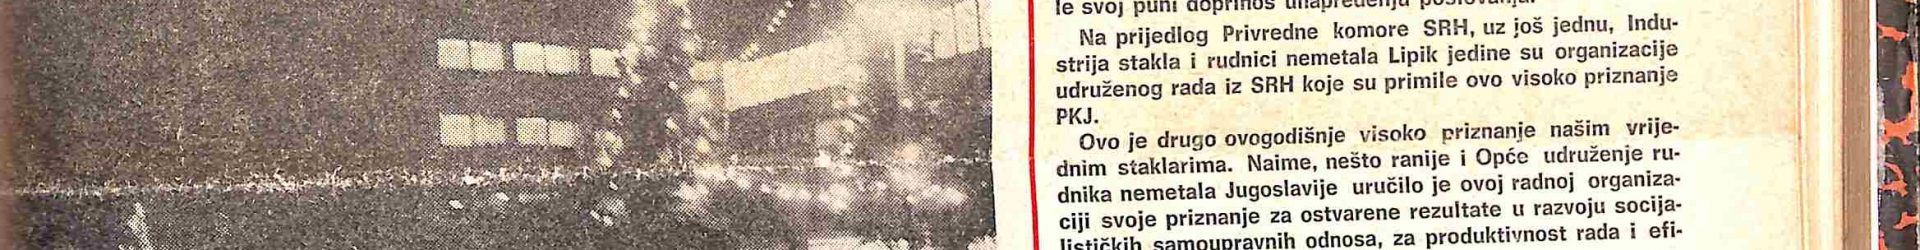 30. prosinca 1980